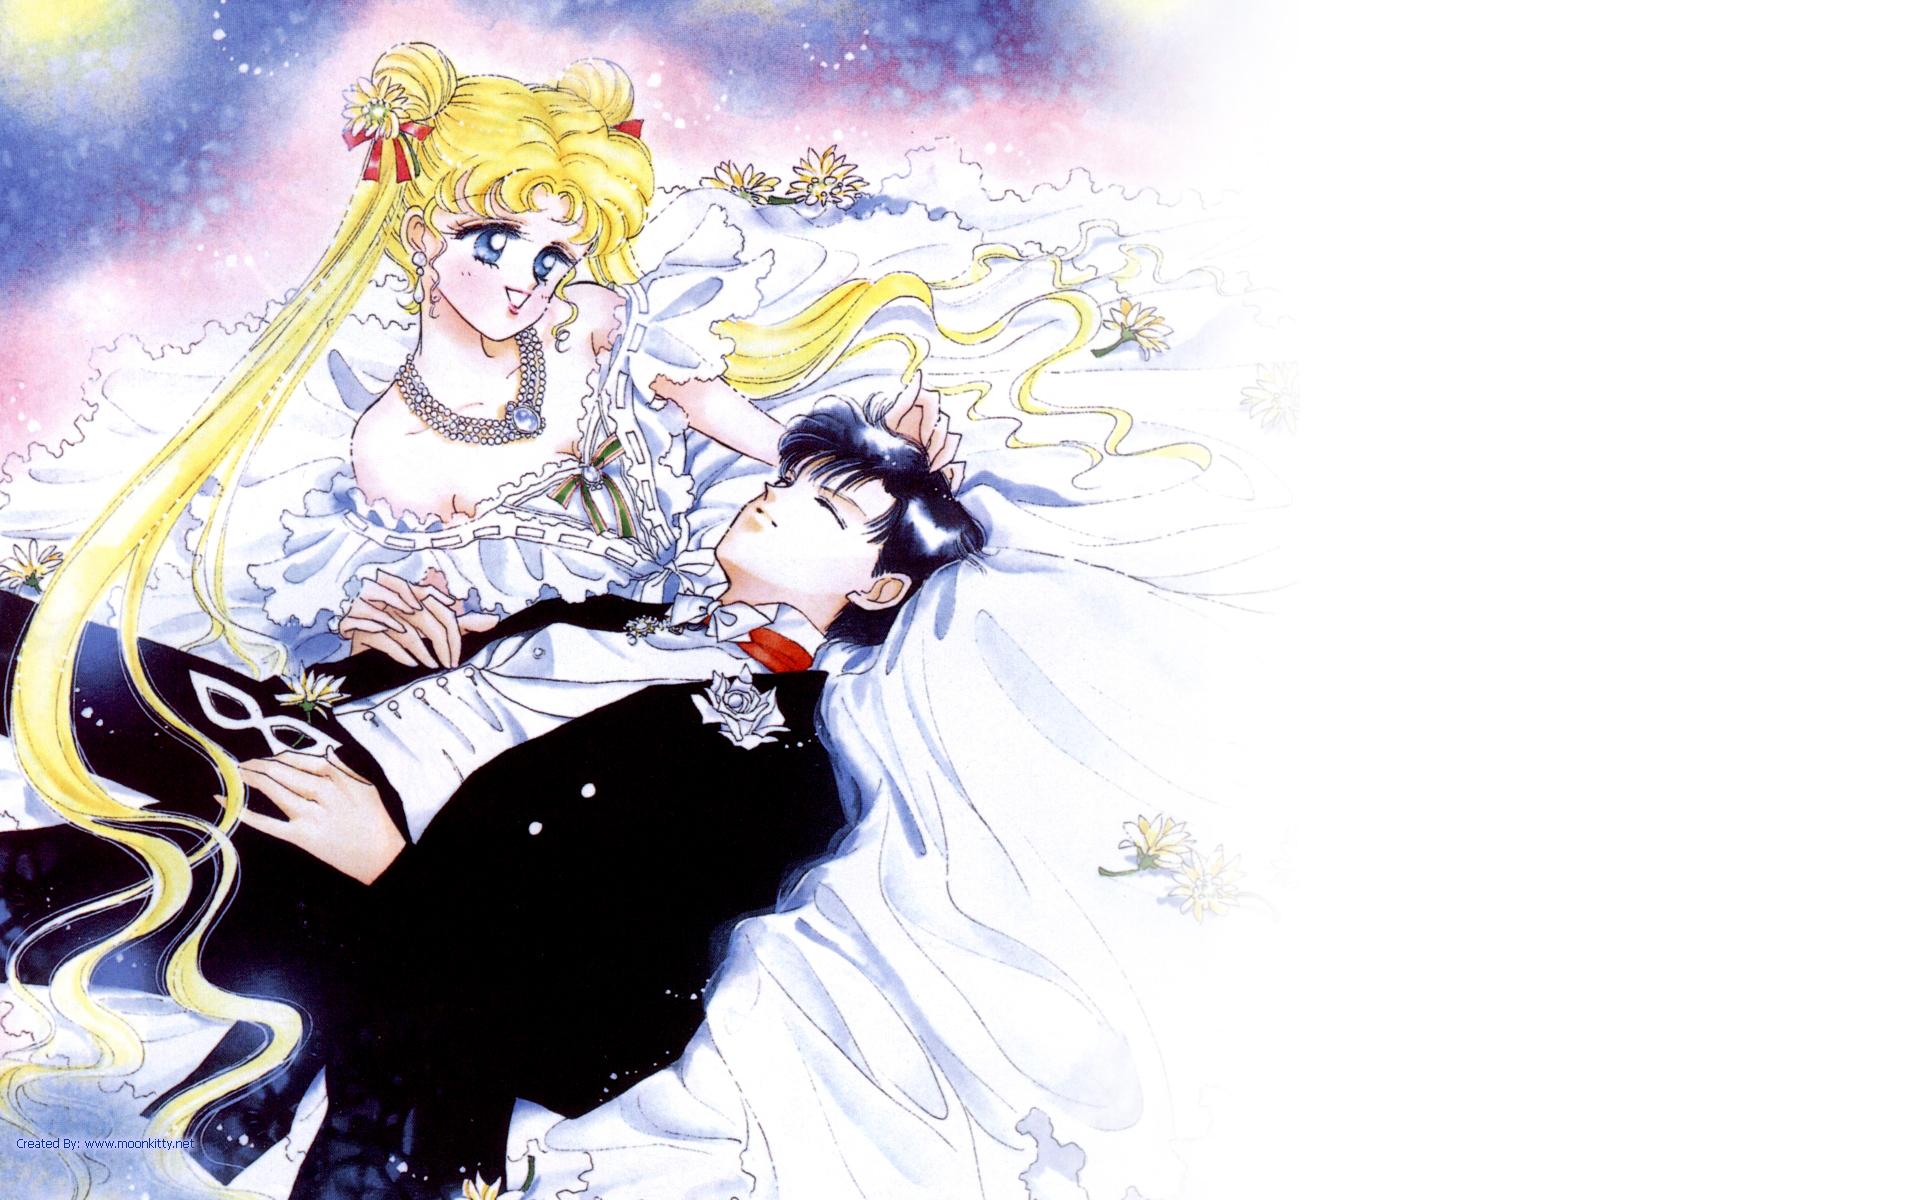 Fuentes De Informacin Sailor Moon Wallpapers Manga X